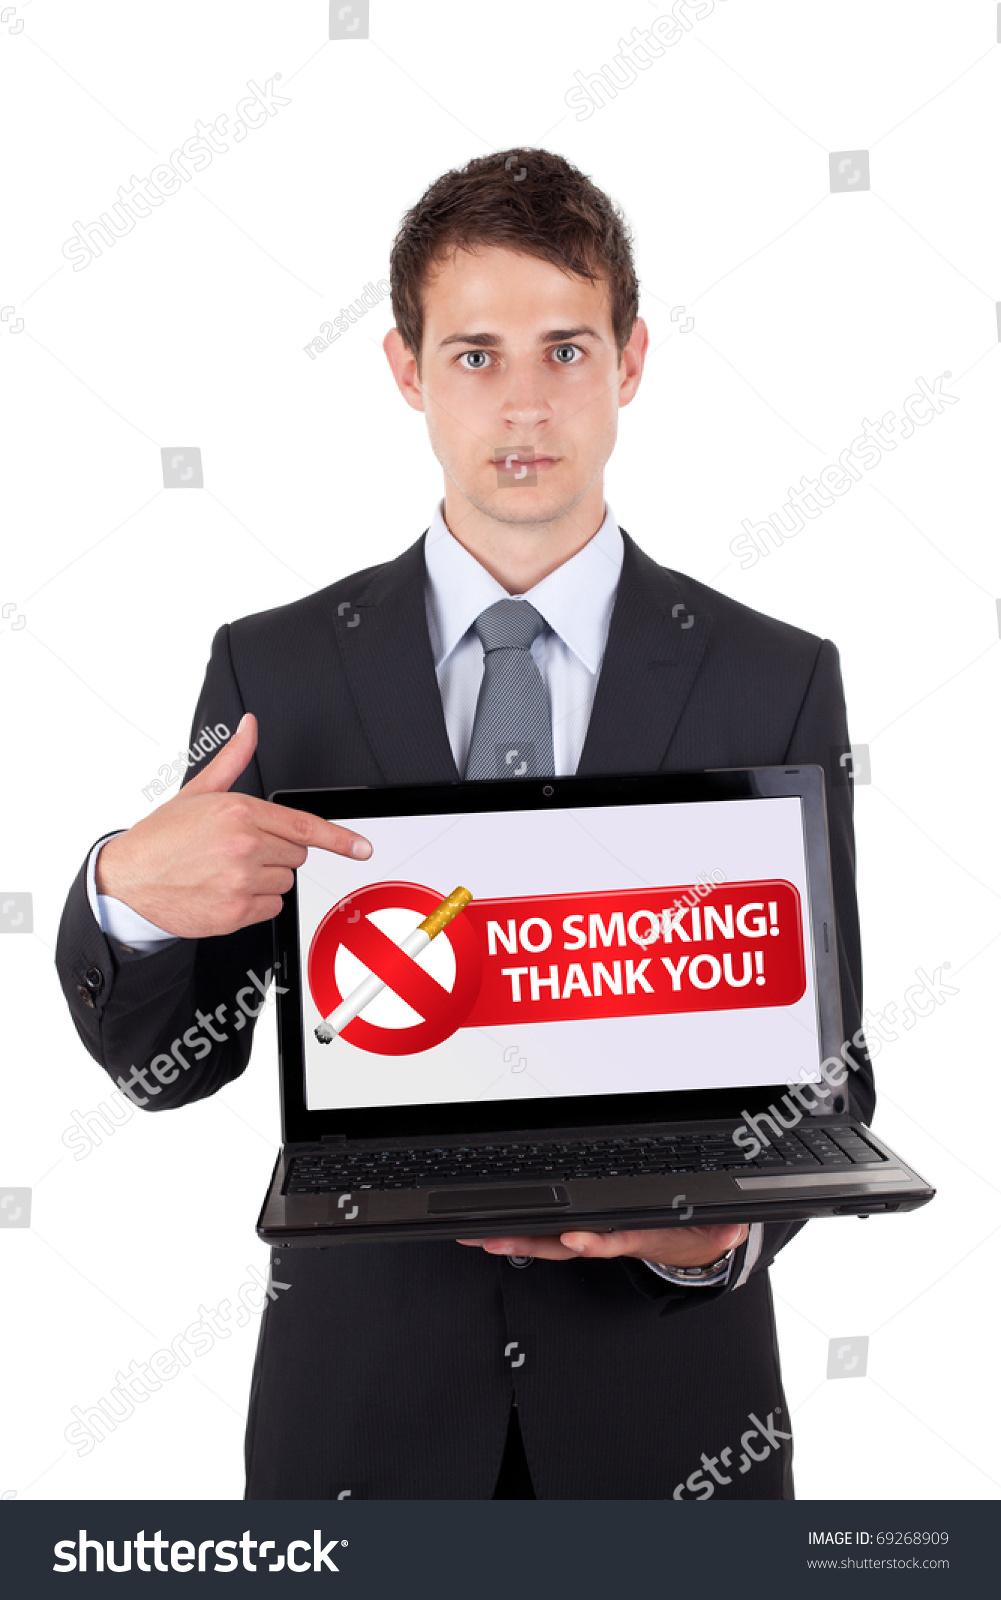 Paul smoker no stock options